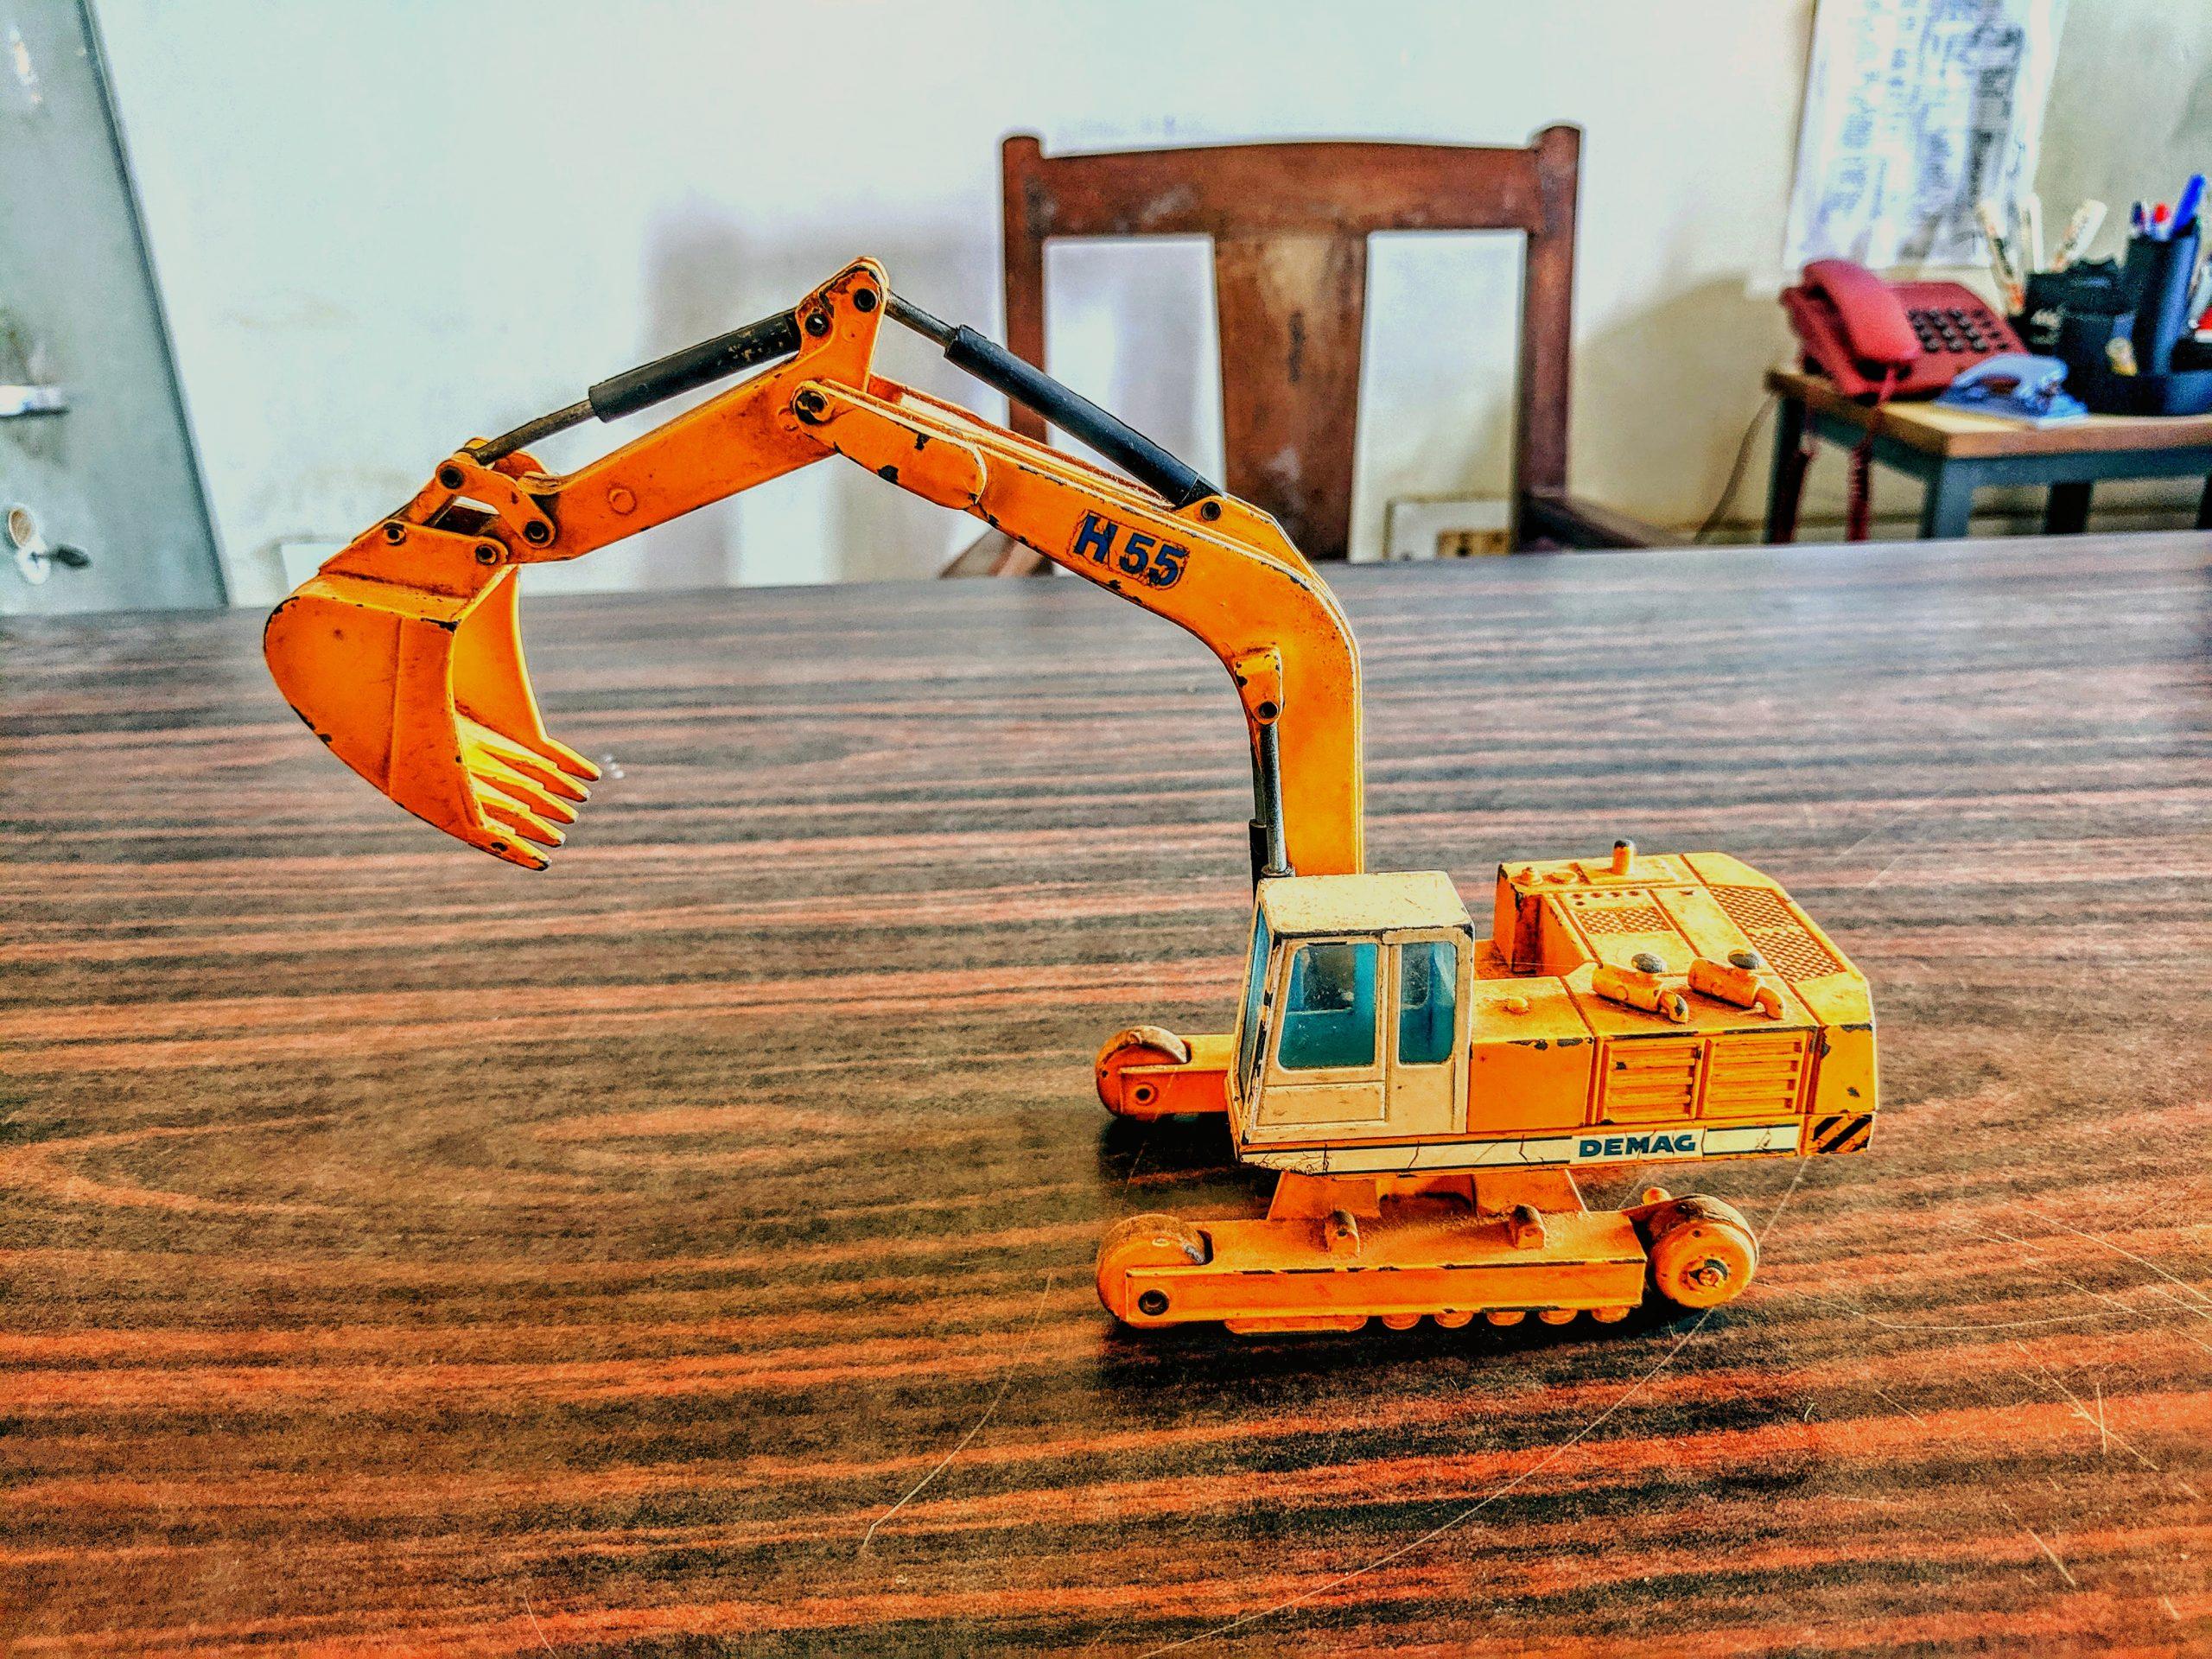 A toy excavator